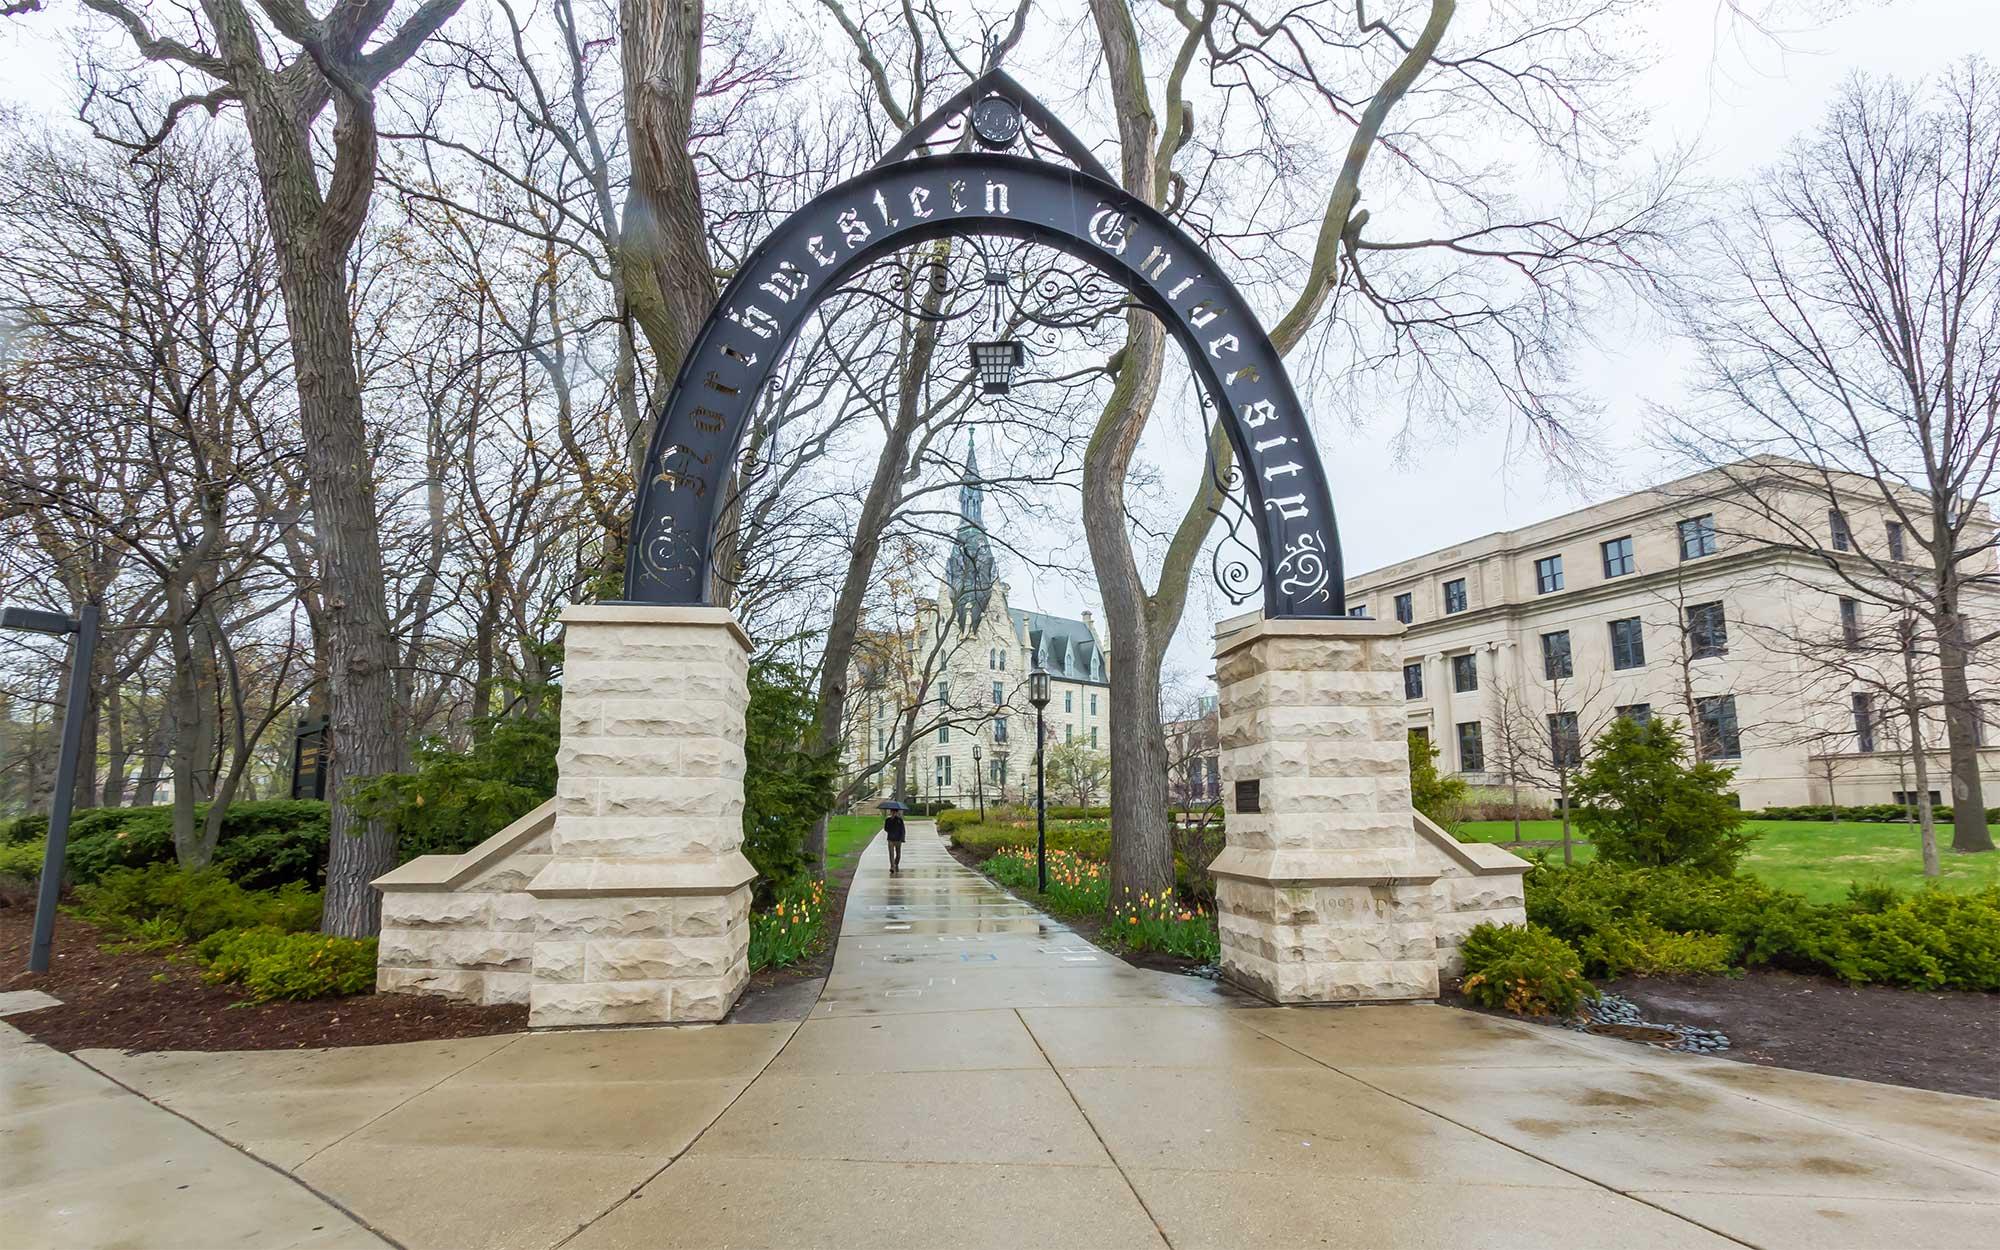 Northwestern University entrance with archway